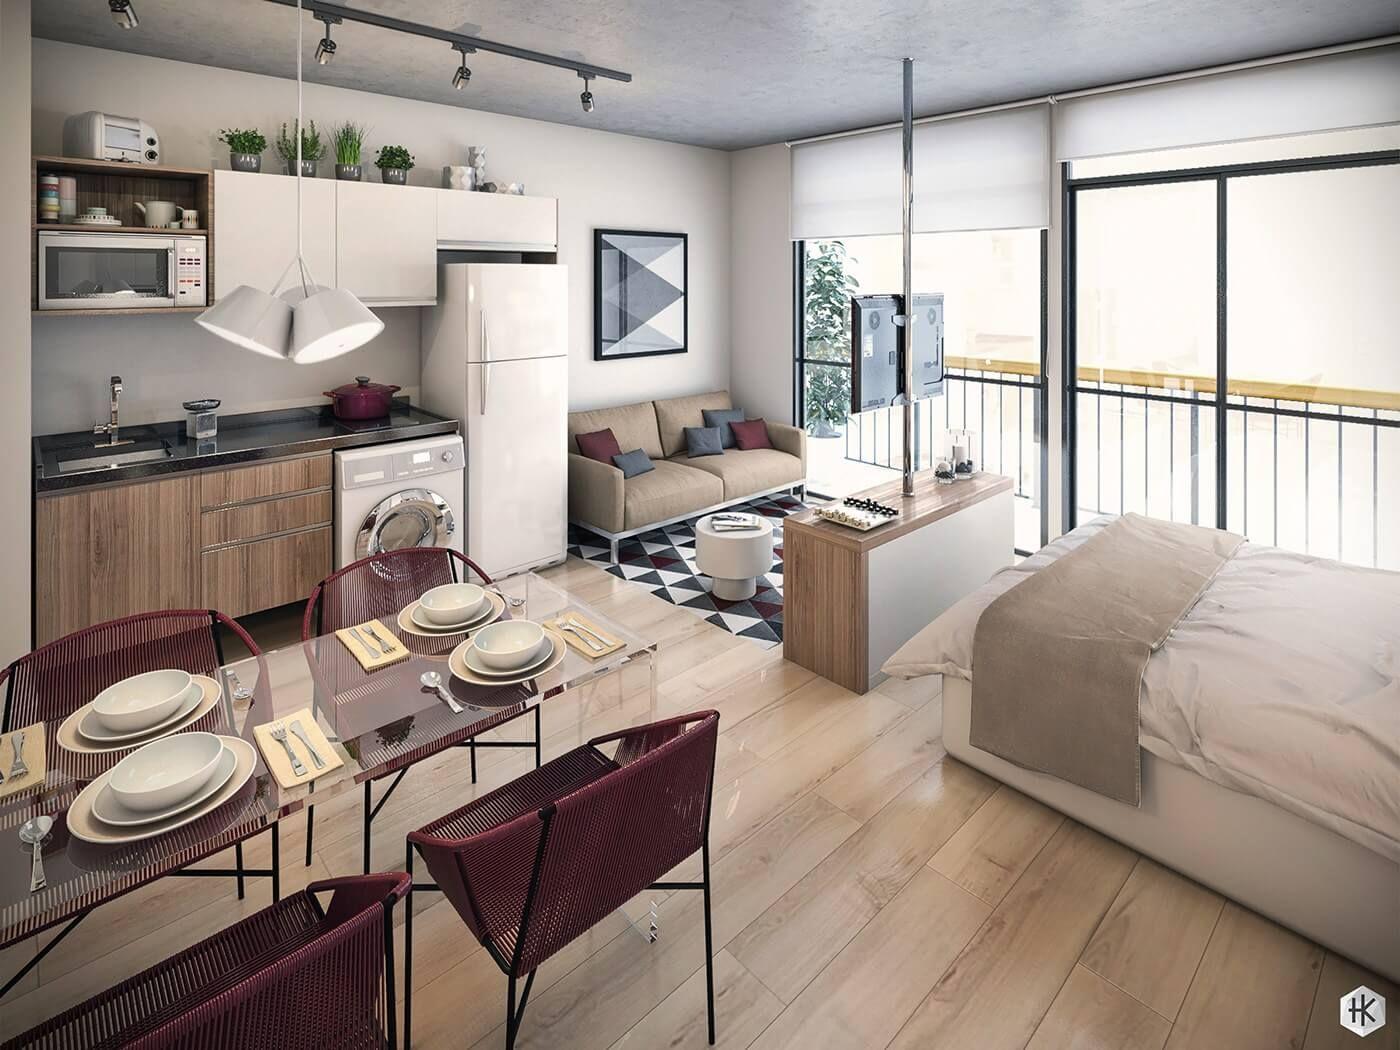 Studio Interior Design Ideas The Artistic Approach To Live In A Small Apartment Small Apartment Interior Apartment Interior Apartment Interior Design